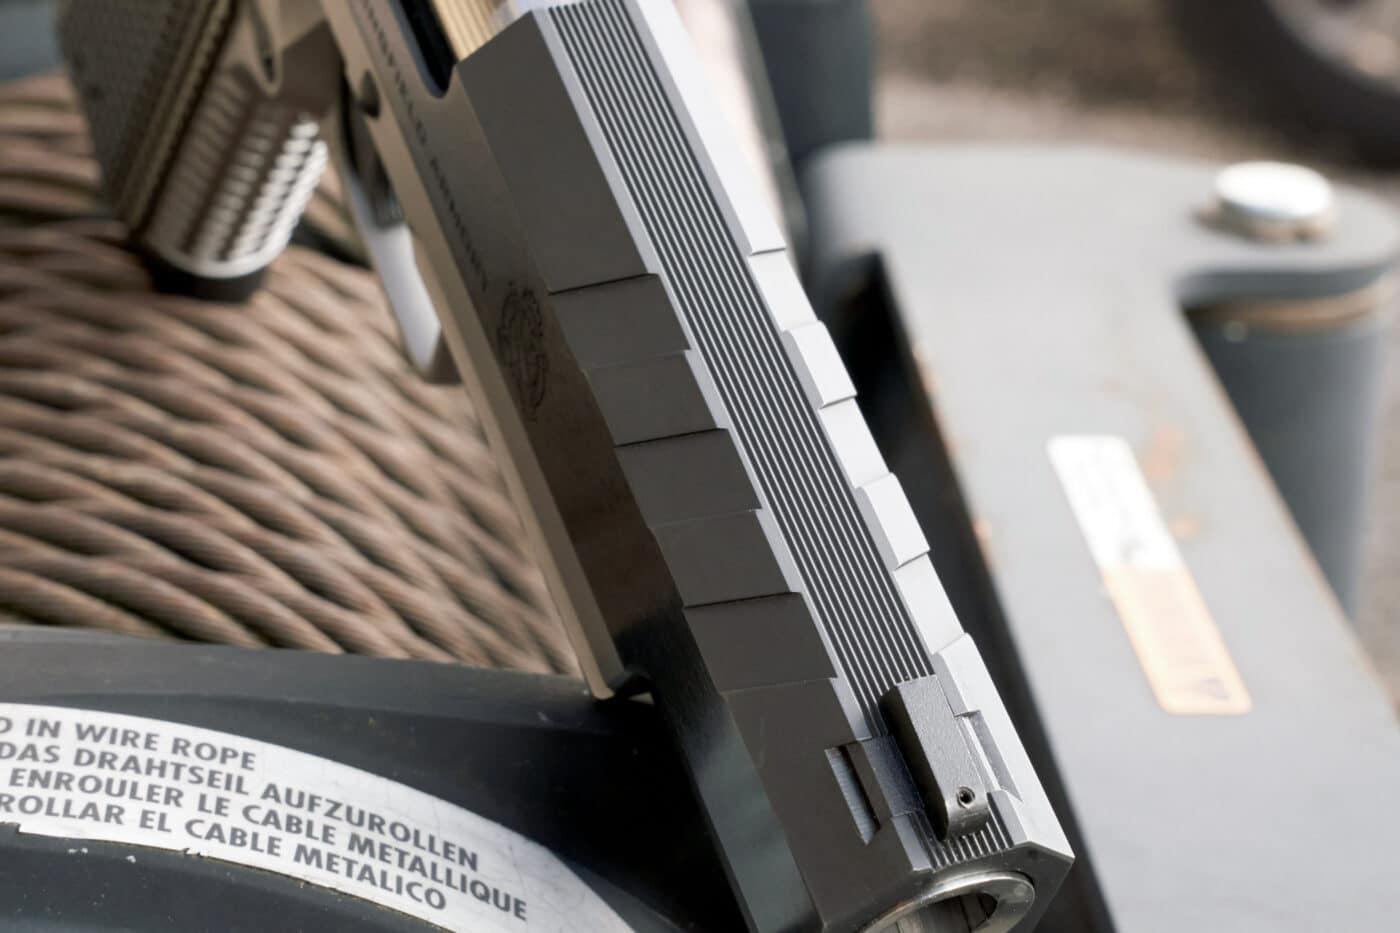 Springfield Armory Emissary slide